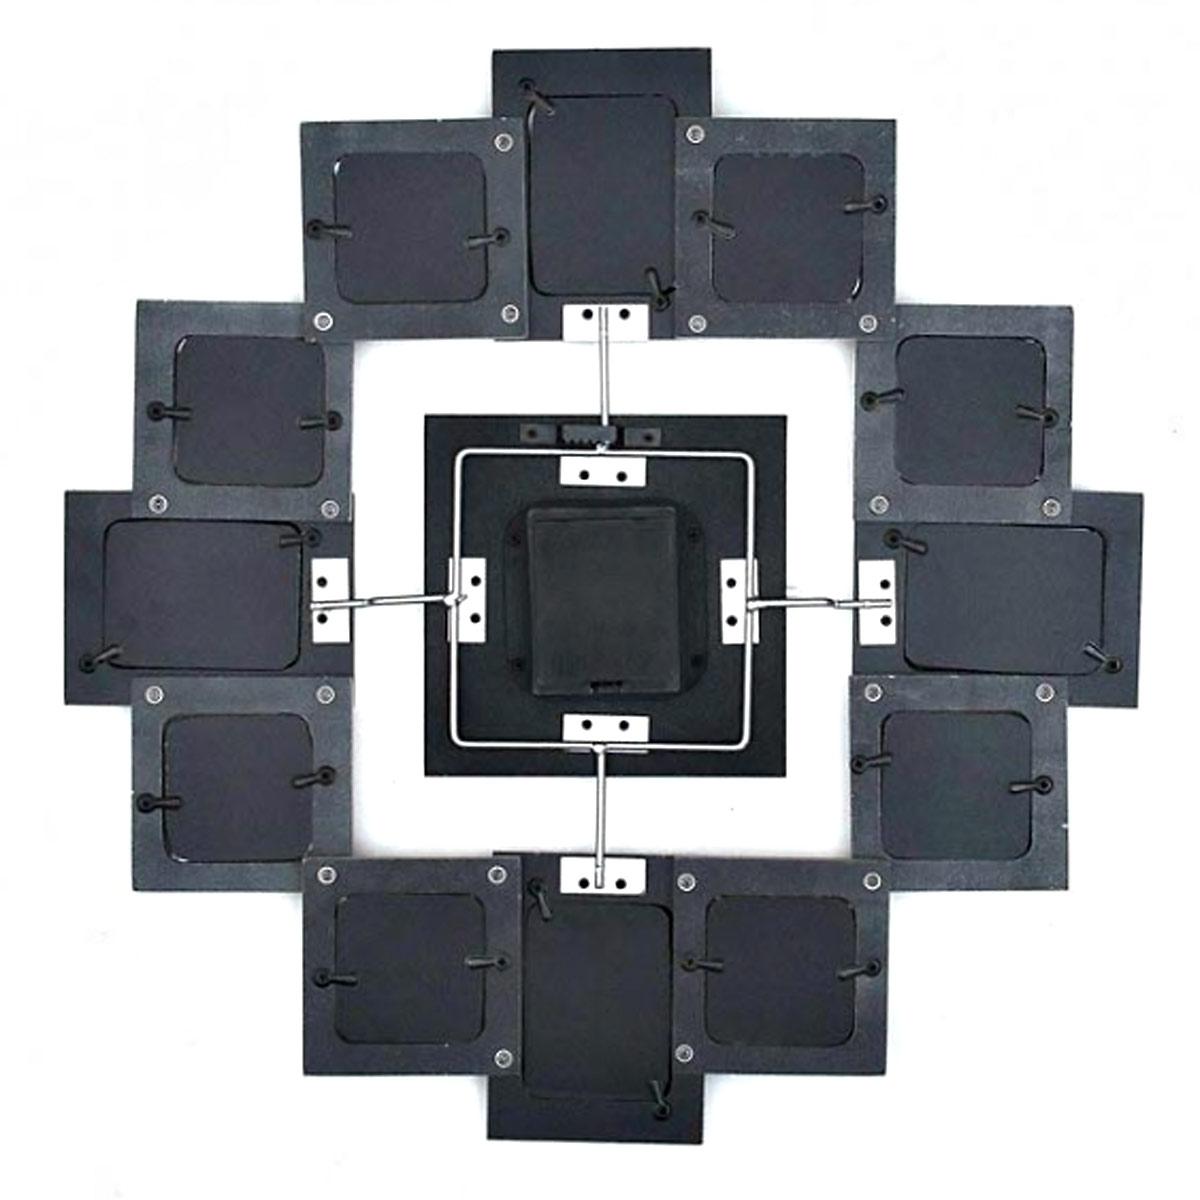 xxl bilderrahmenuhr fotorahmen wanduhr bilderrahmen uhr k chenuhr bilderuhr ebay. Black Bedroom Furniture Sets. Home Design Ideas